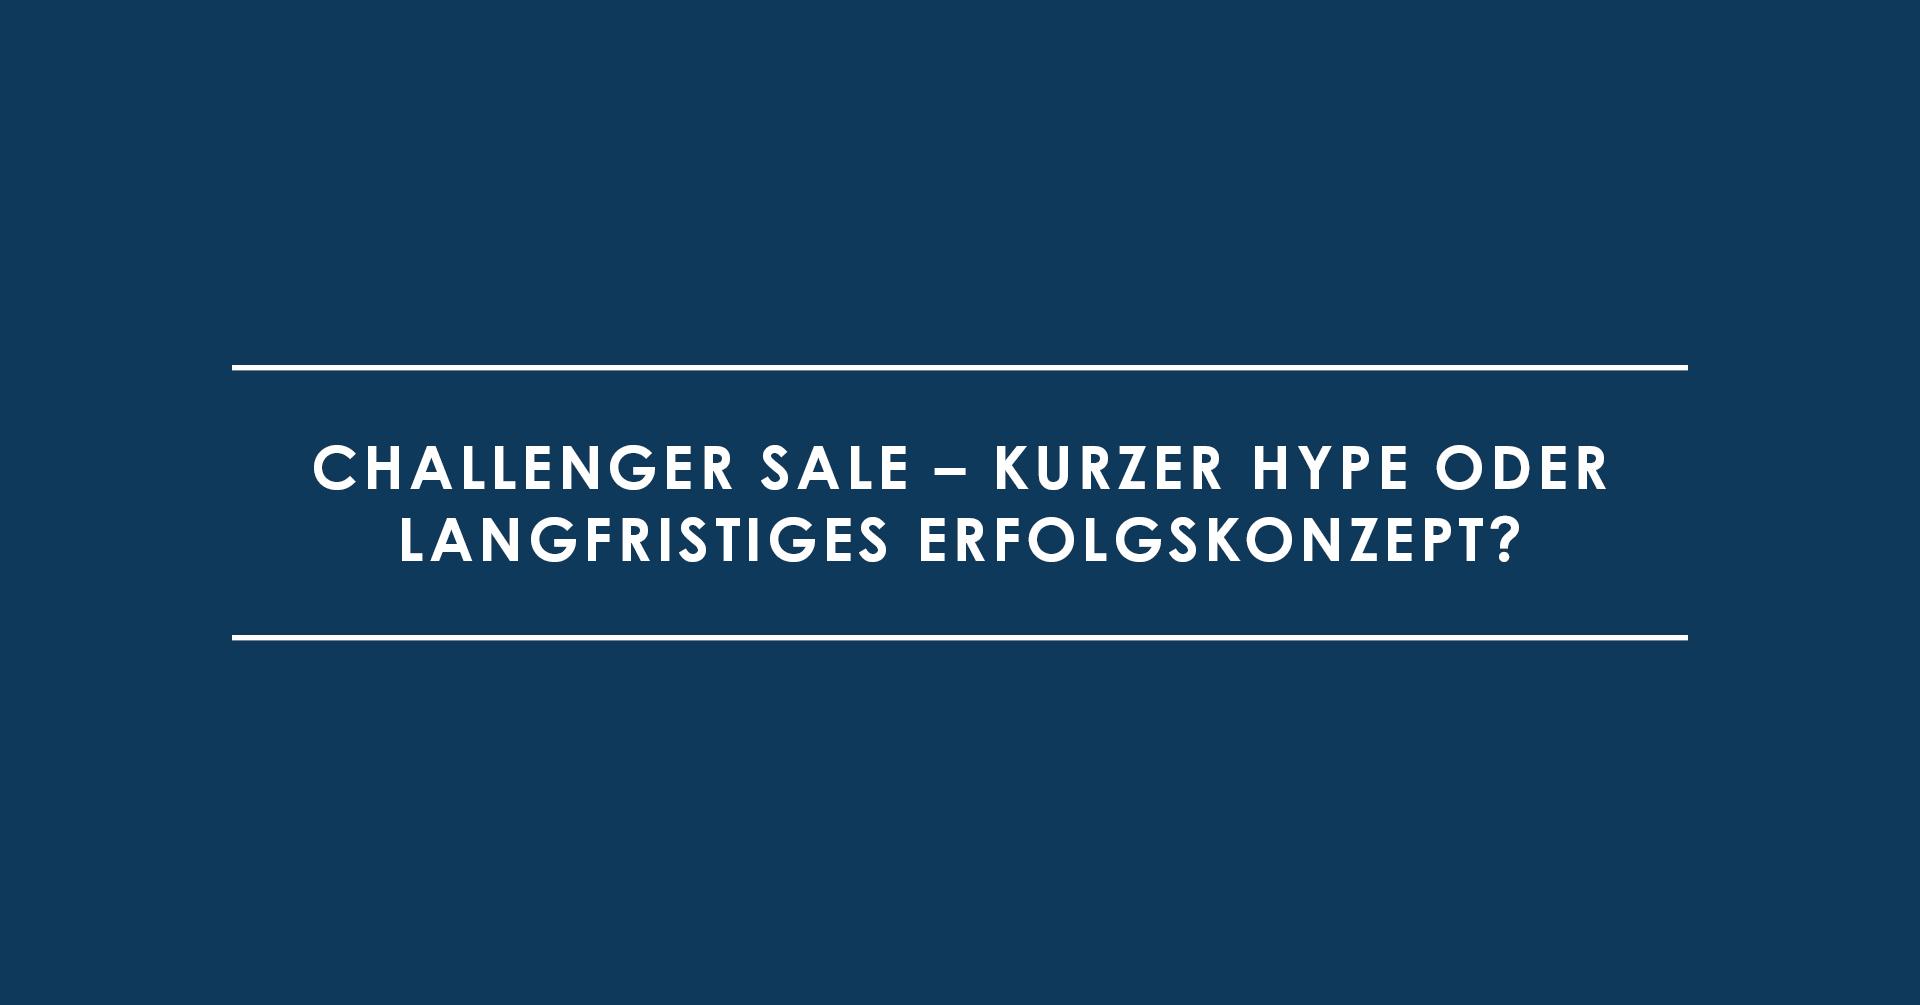 Challenger Sale – Kurzer Hype oder langfristiges Erfolgskonzept?